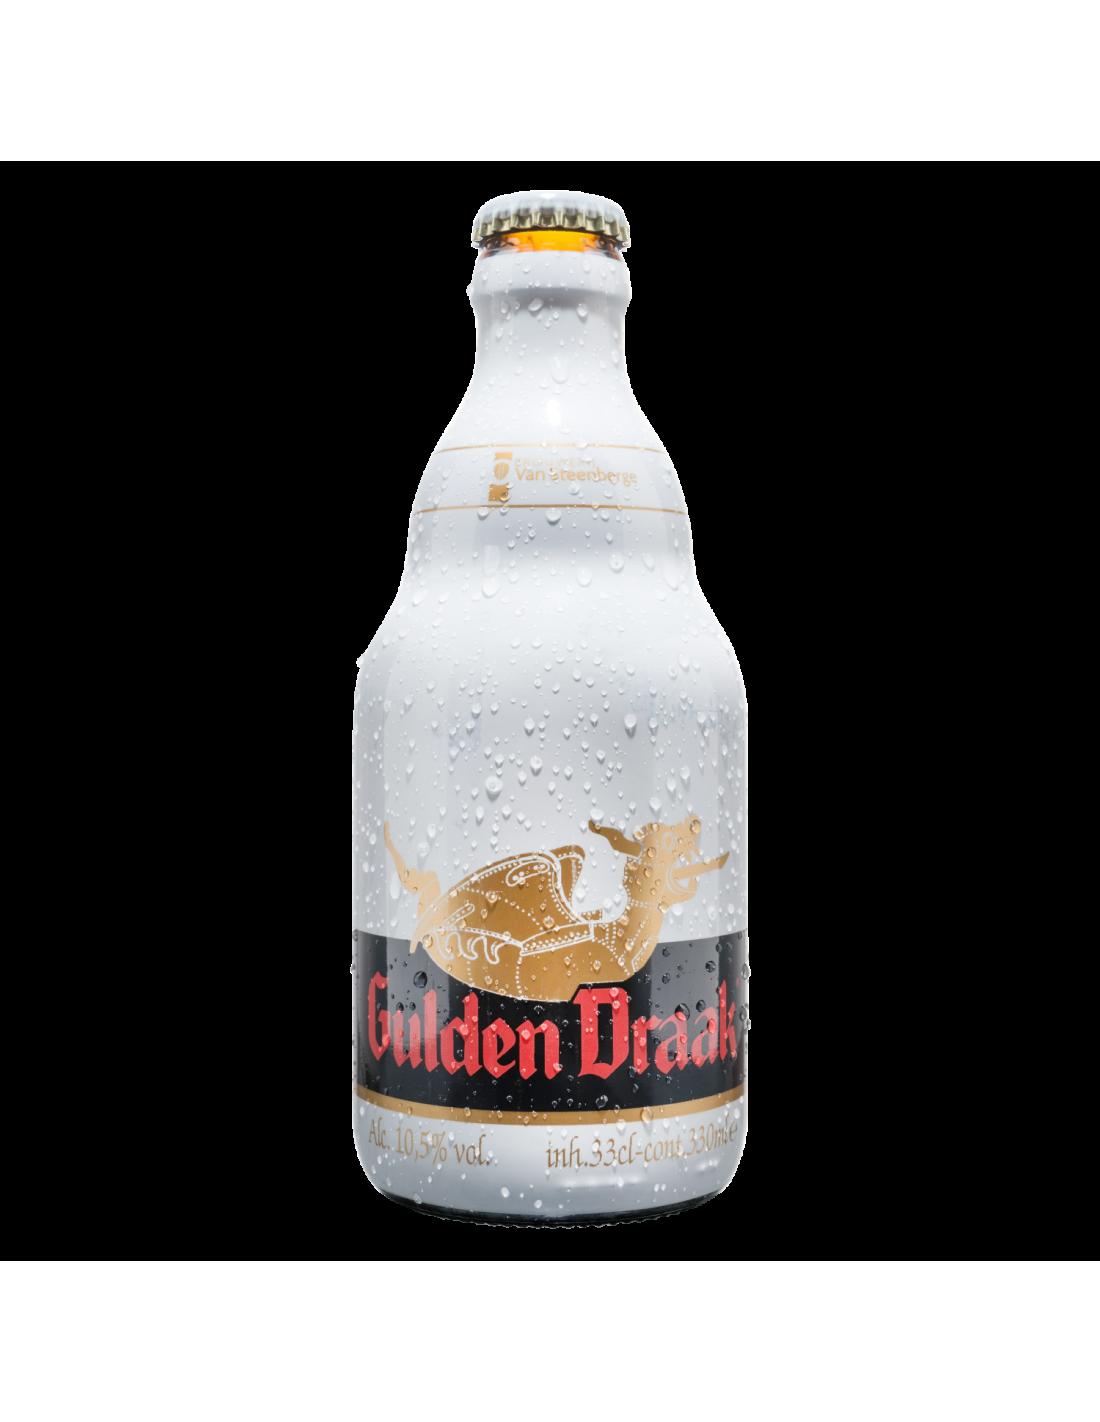 Bere neagra, filtrata Gulden Draak, 10.5% alc., 0.33L, Belgia